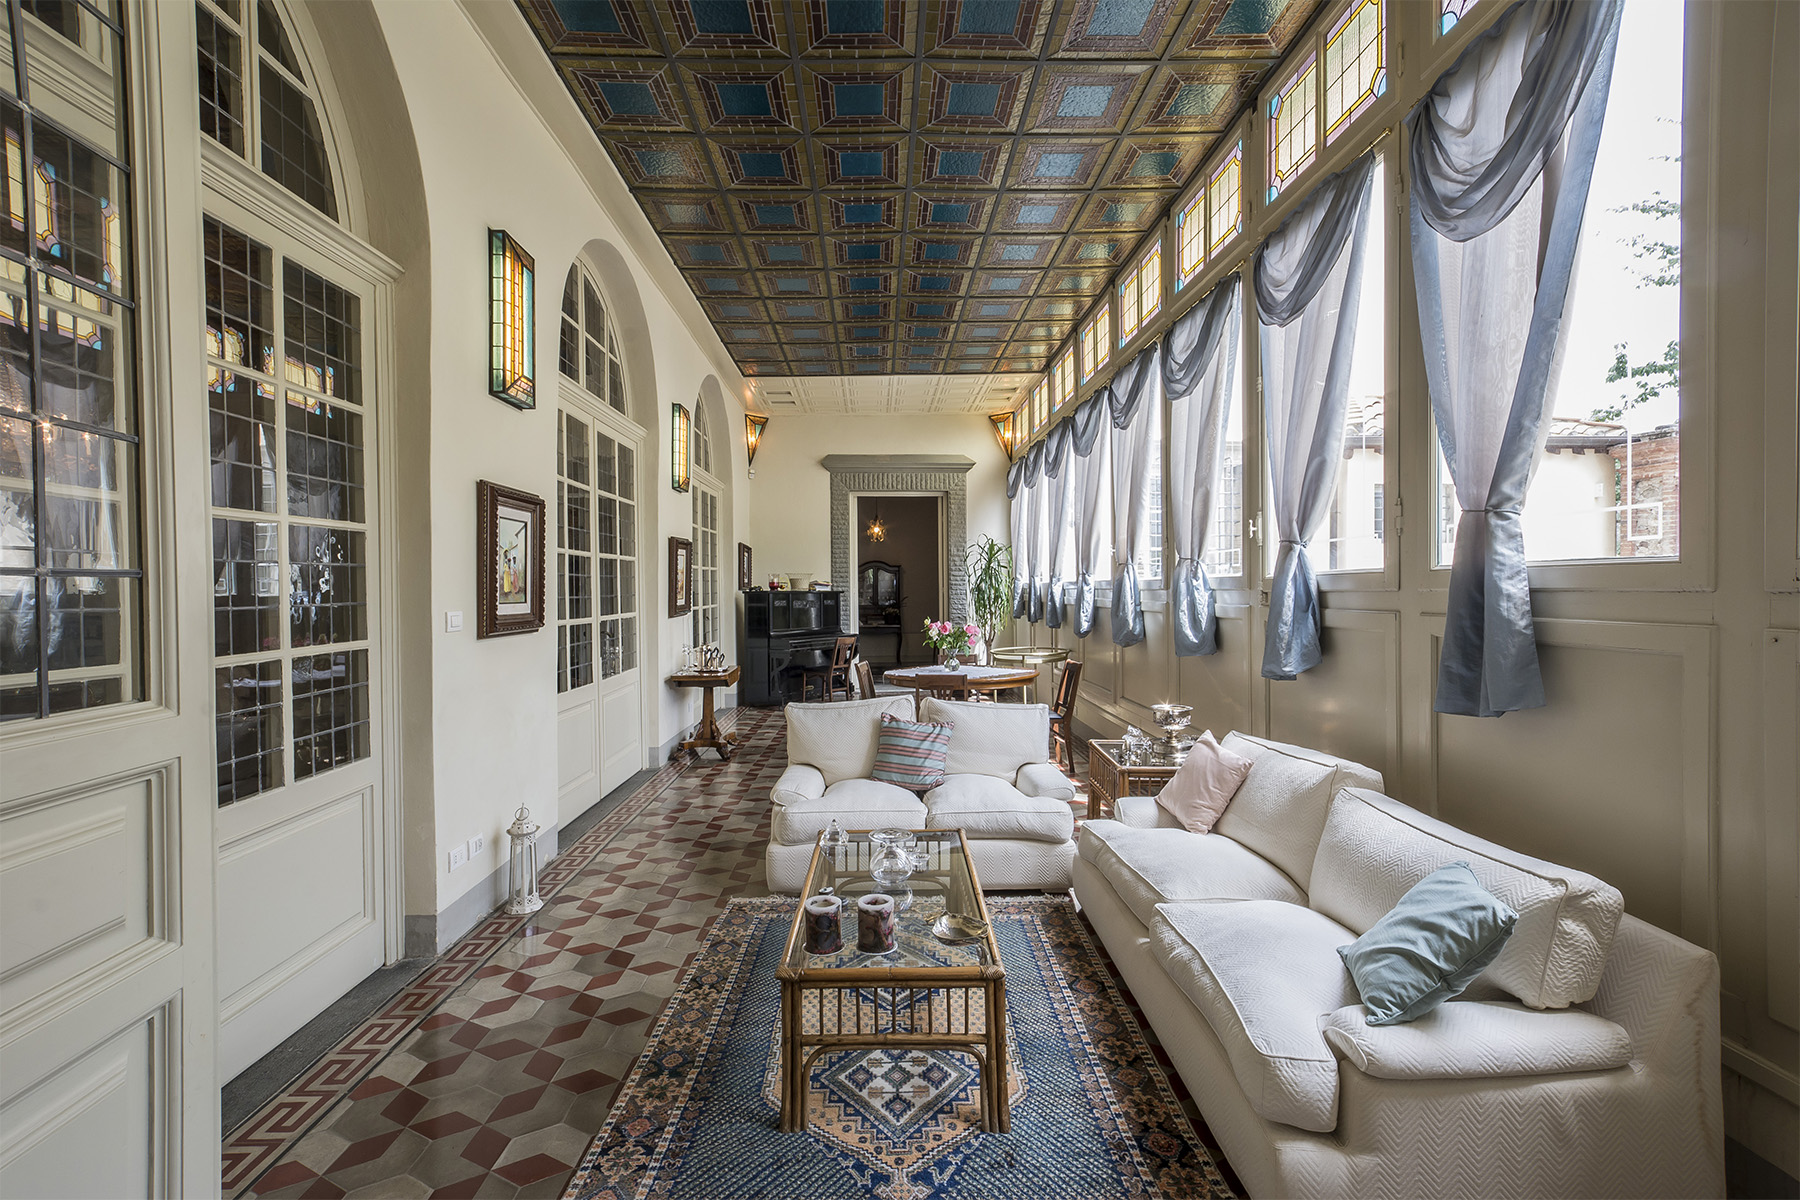 Villa in Vendita a Lucca: 5 locali, 1200 mq - Foto 5